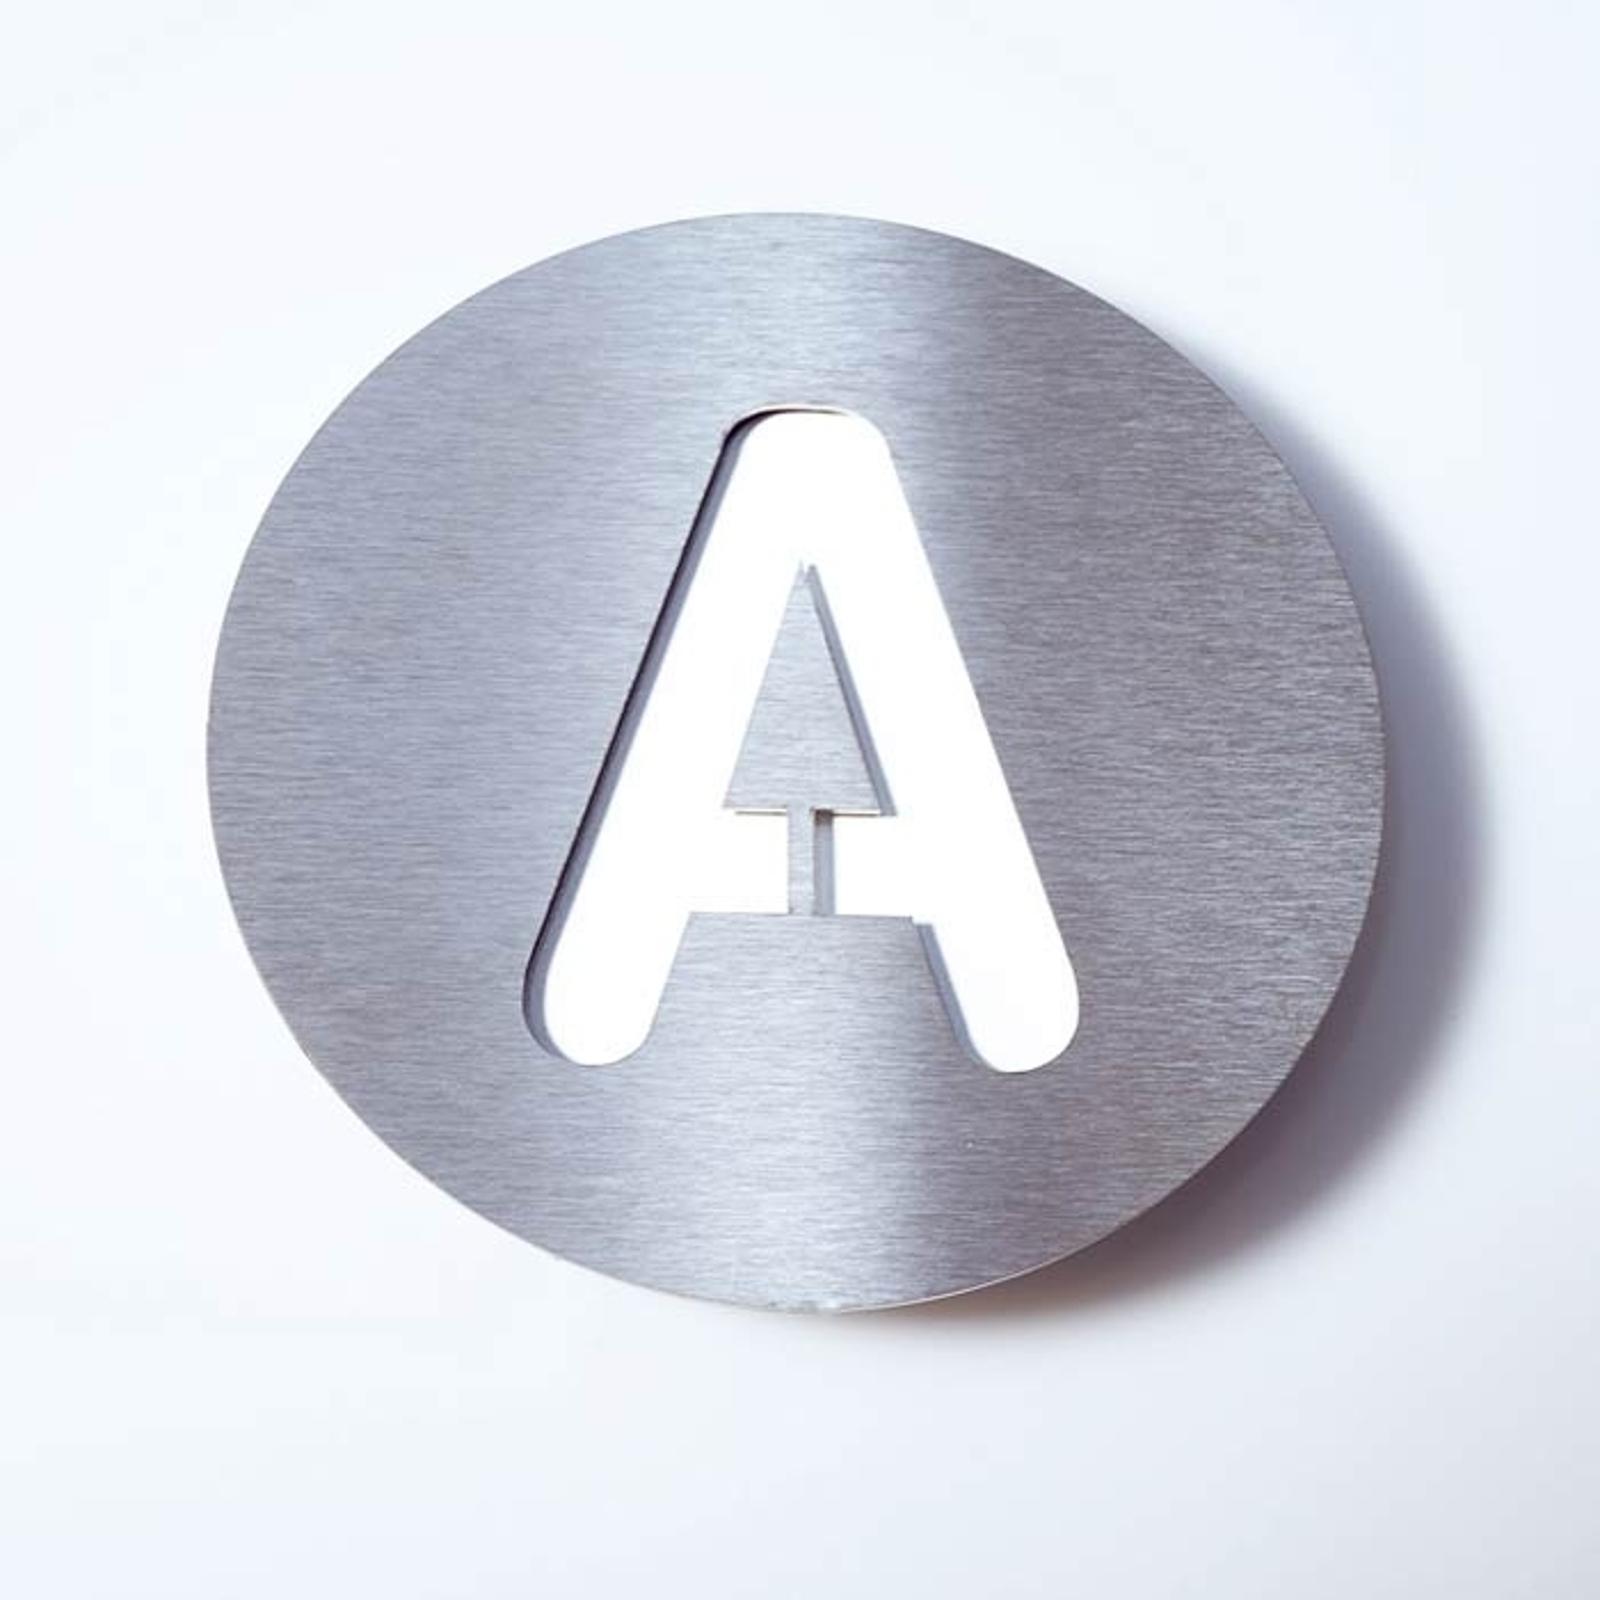 Rostfri-husnummer Round - A